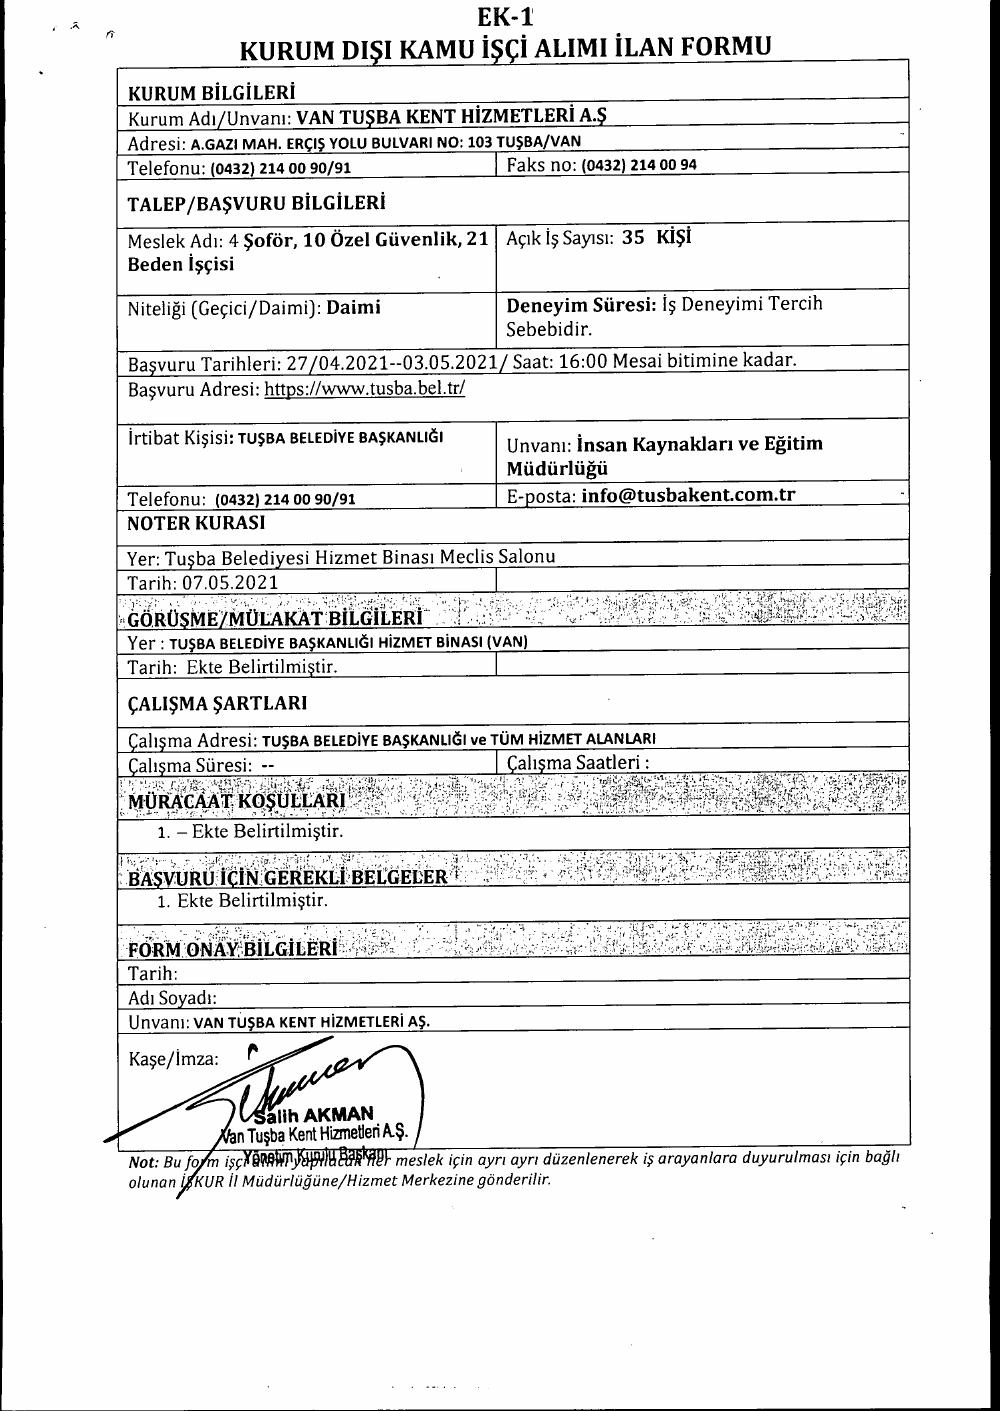 van-tusba-kent-hizmetleri-tic-a-s-03-05-2021-000001.png